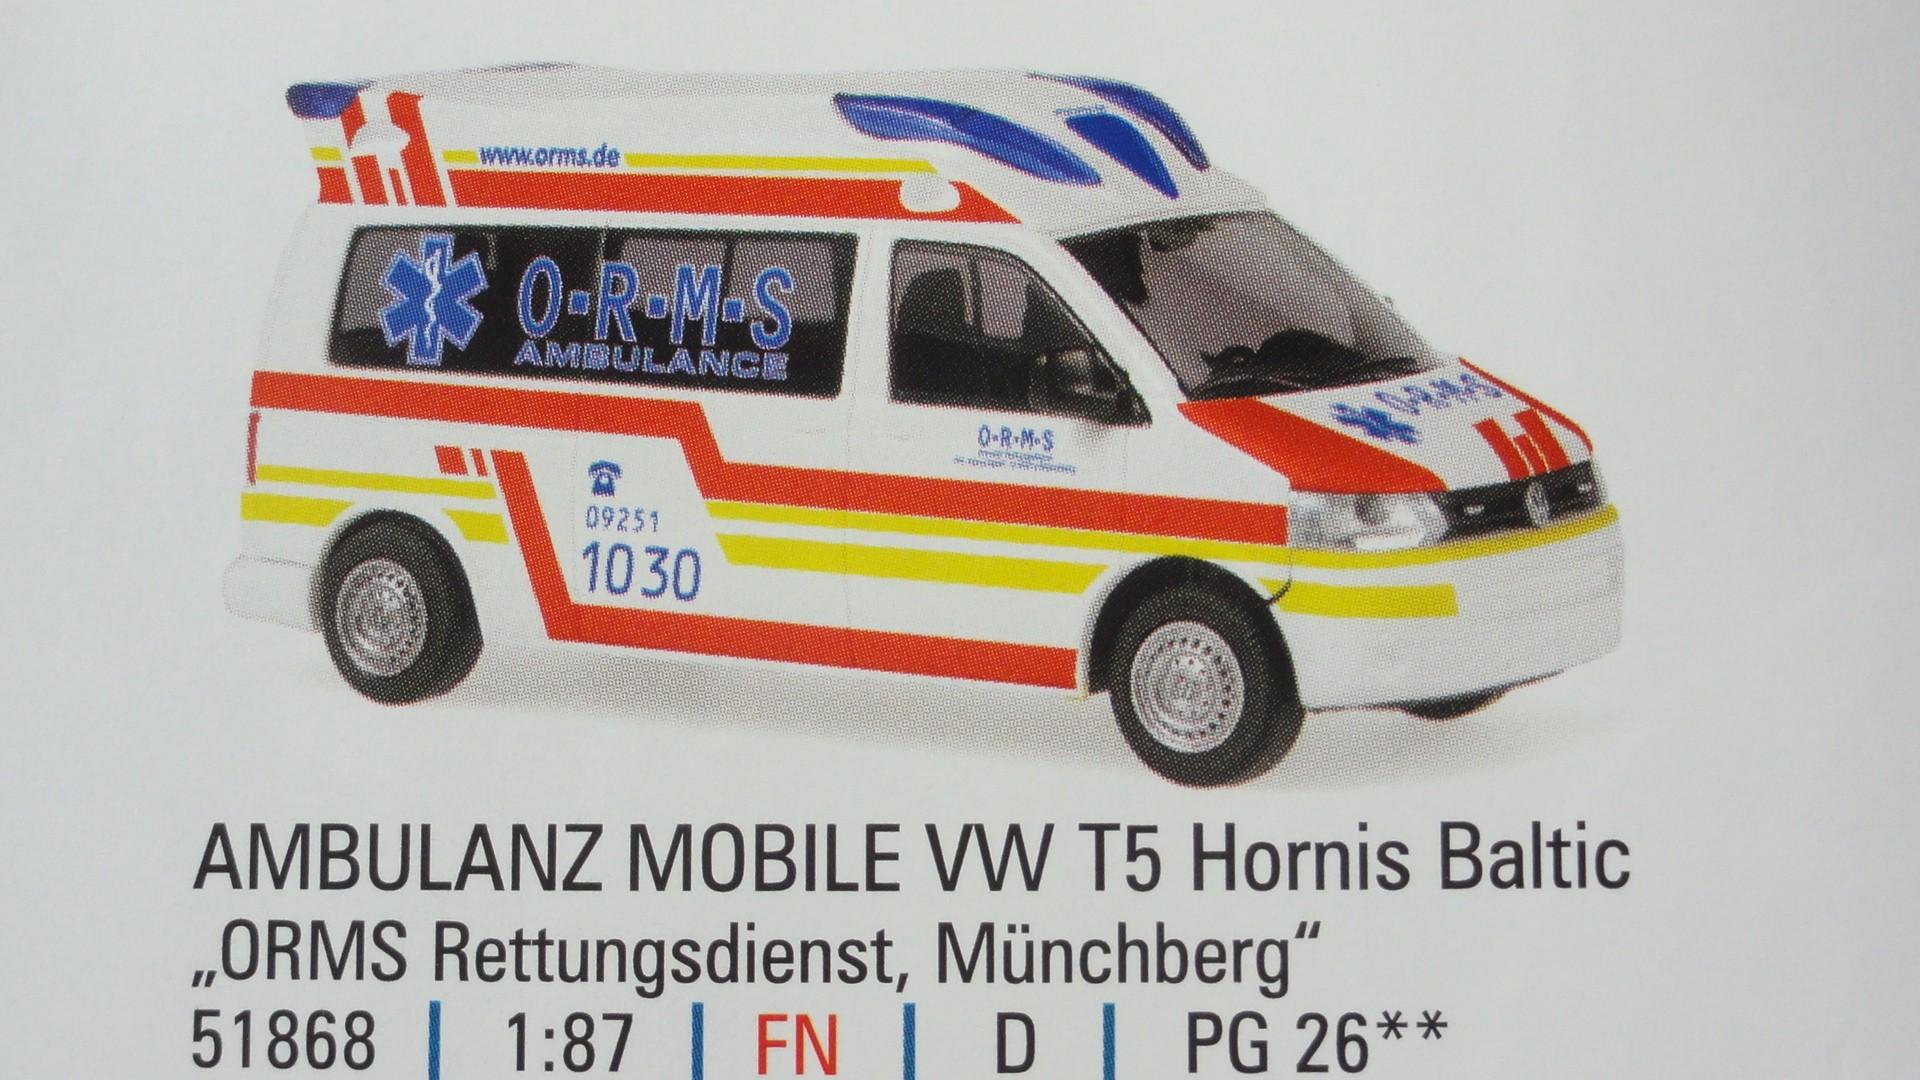 Rietze VW T5 KTW ORMS RD Münchberg